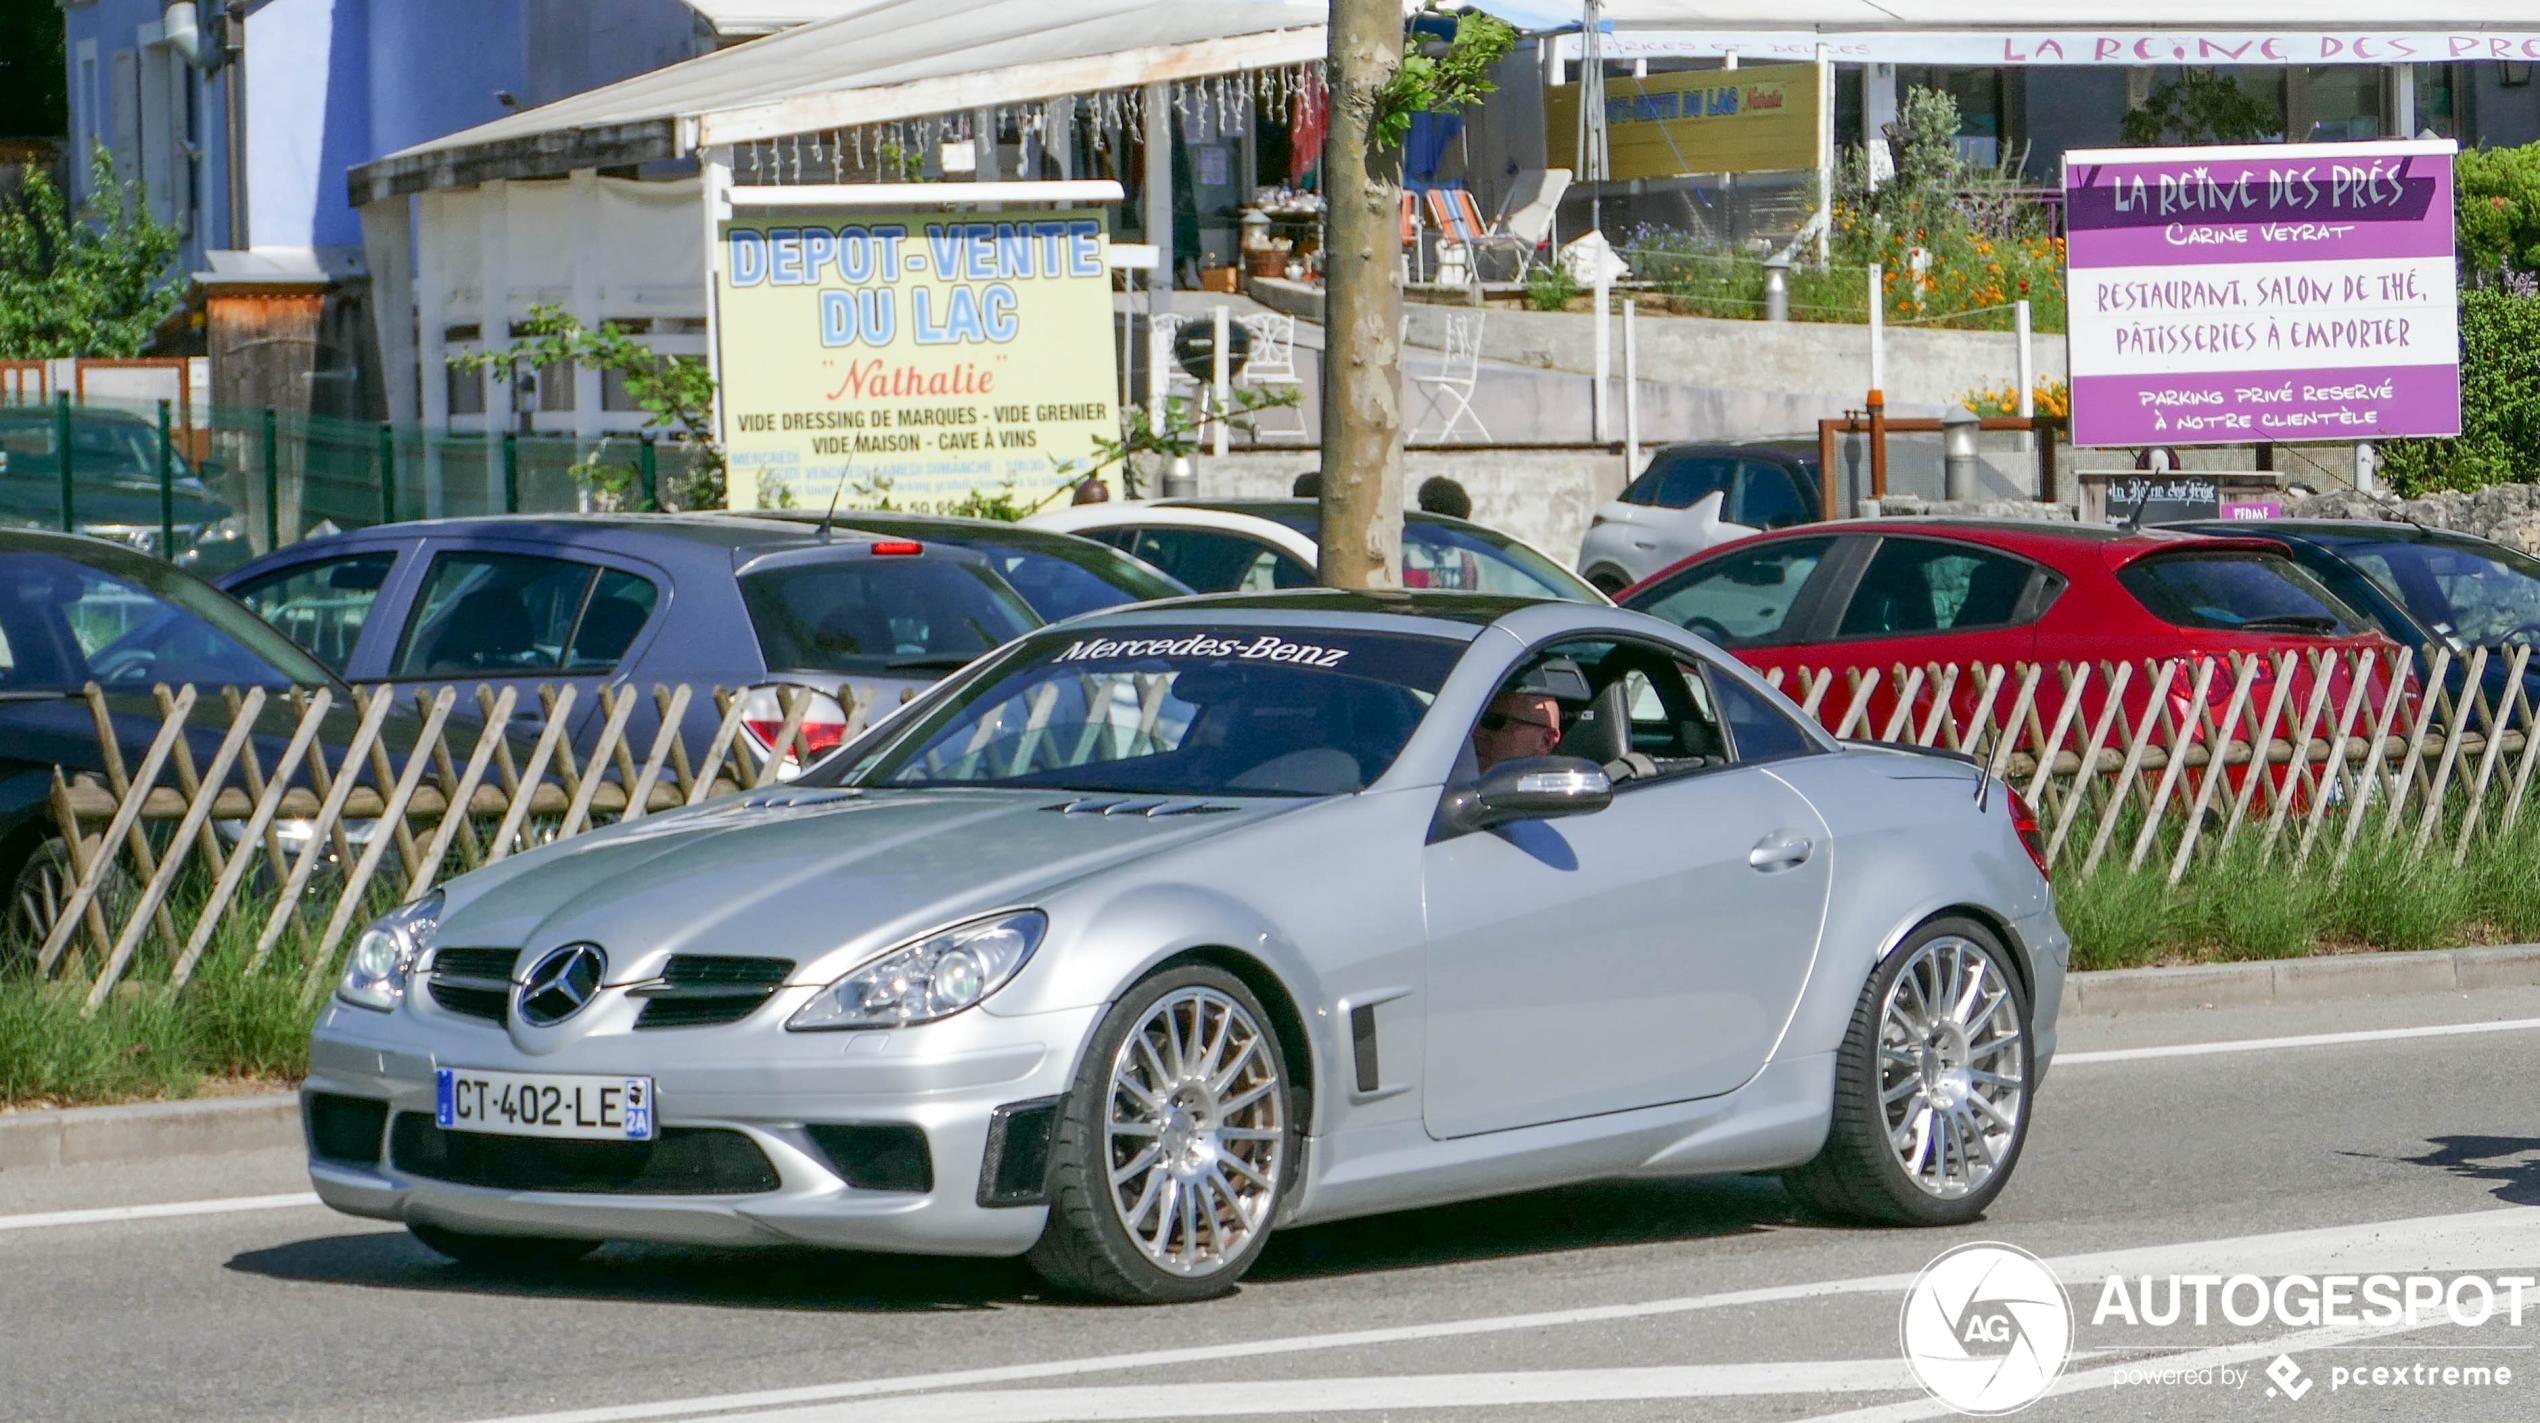 Mercedes-Benz SLK 55 AMG Black Series is uniek kanon